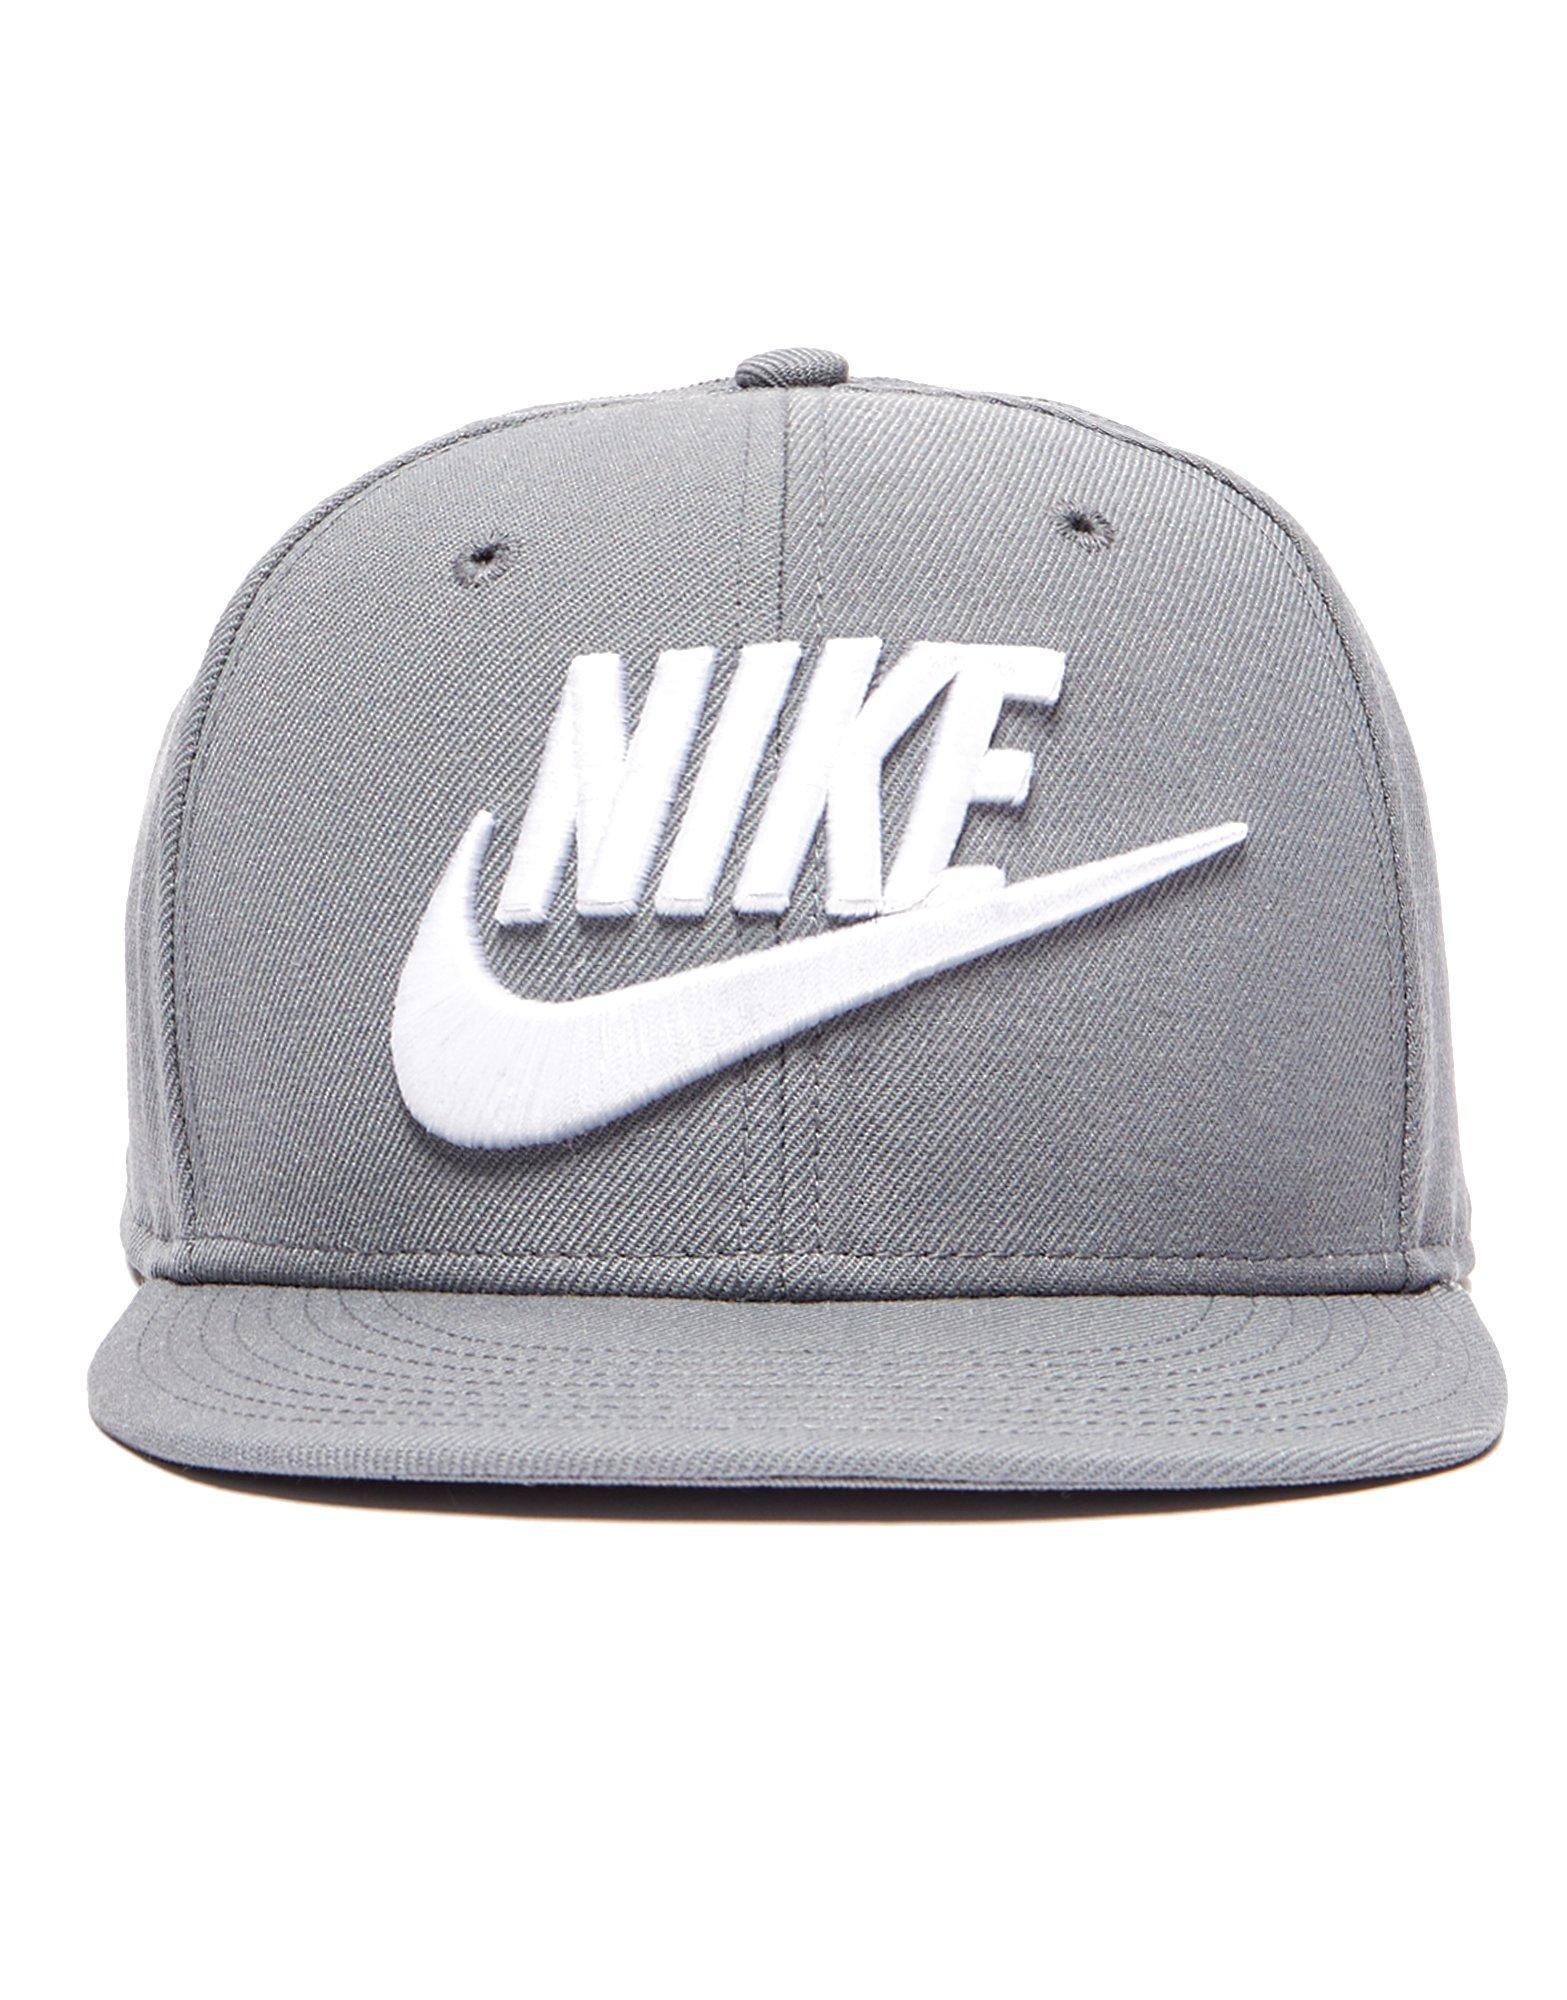 560177b41 Lyst - Nike Futura True 2 Snapback Cap in Gray for Men